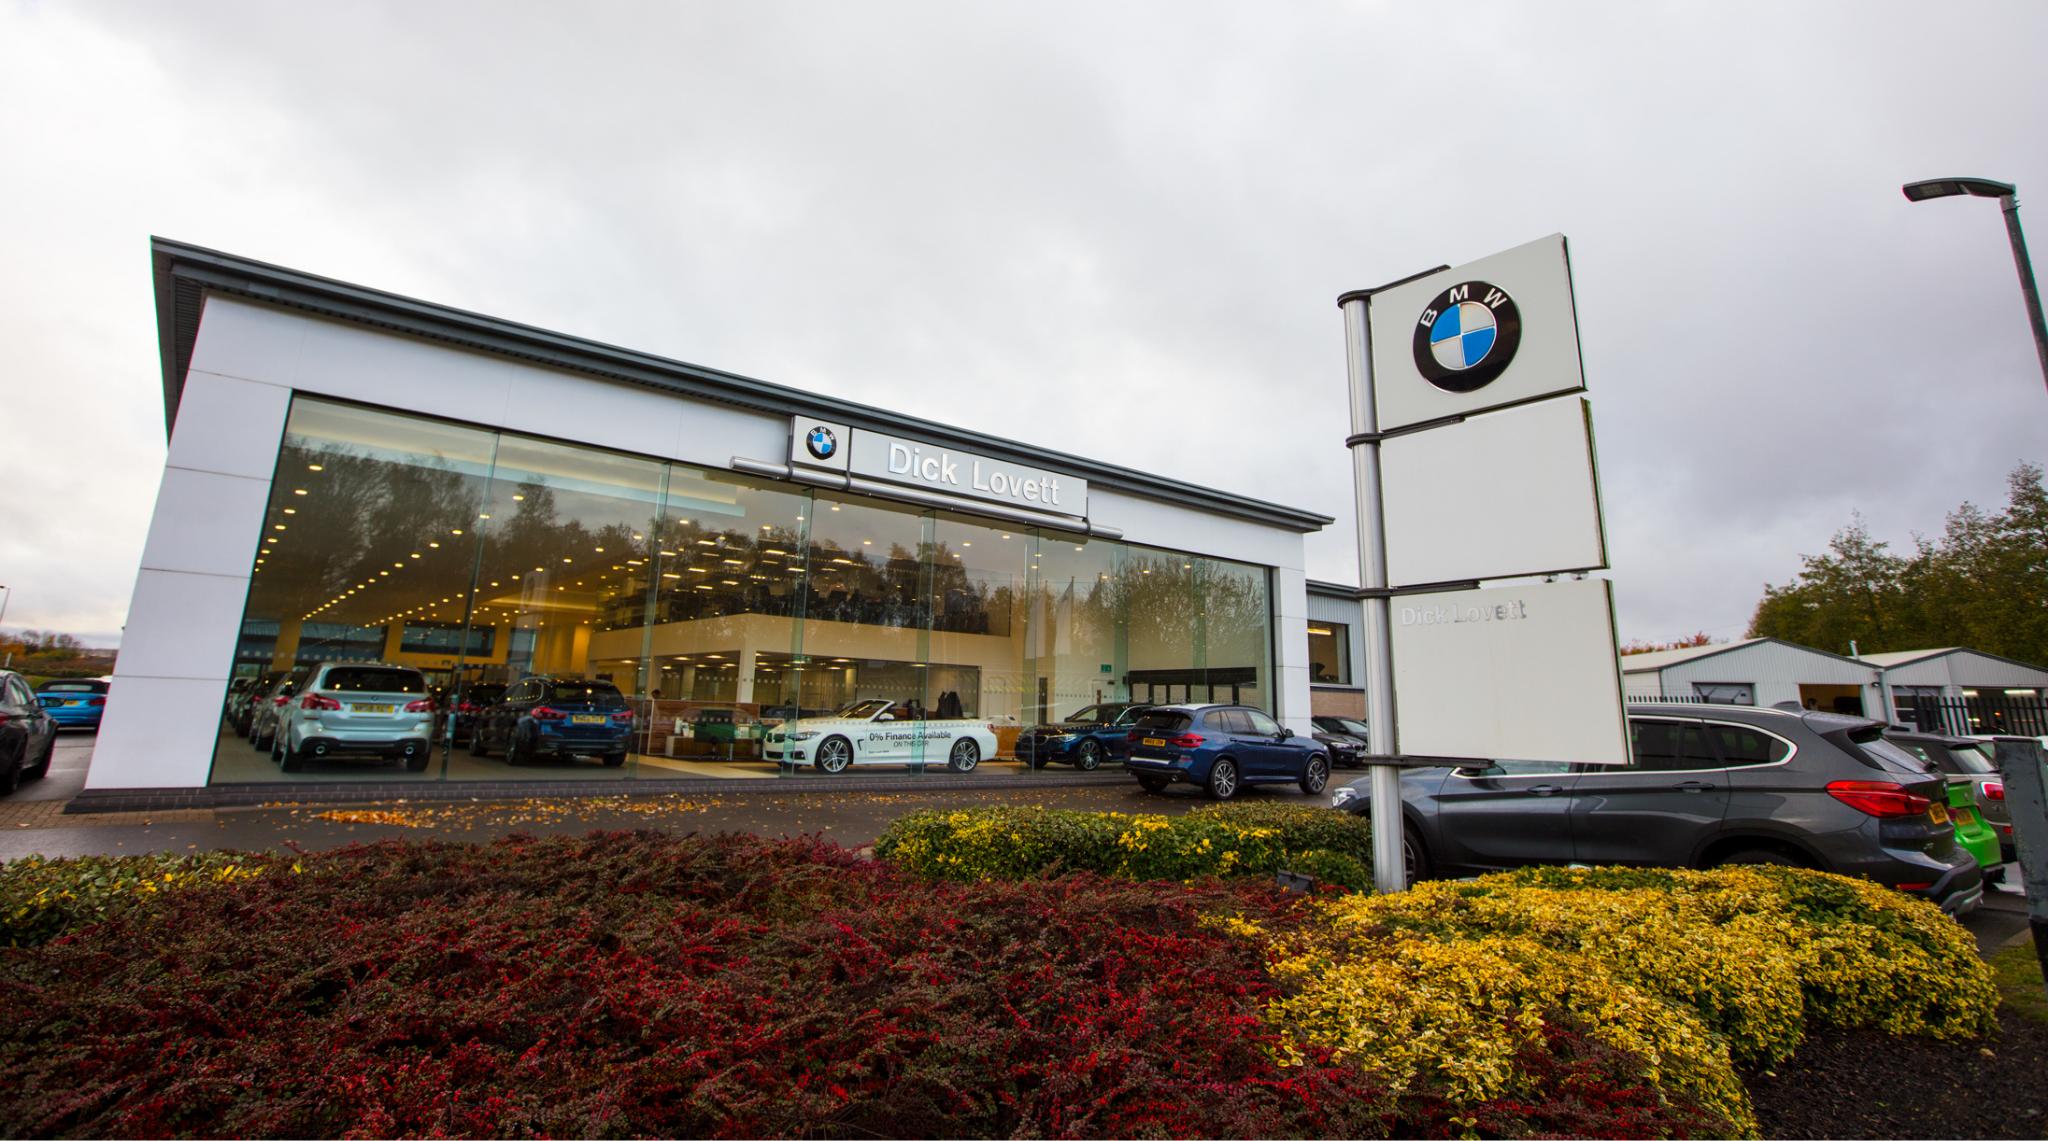 Dick Lovett BMW 3